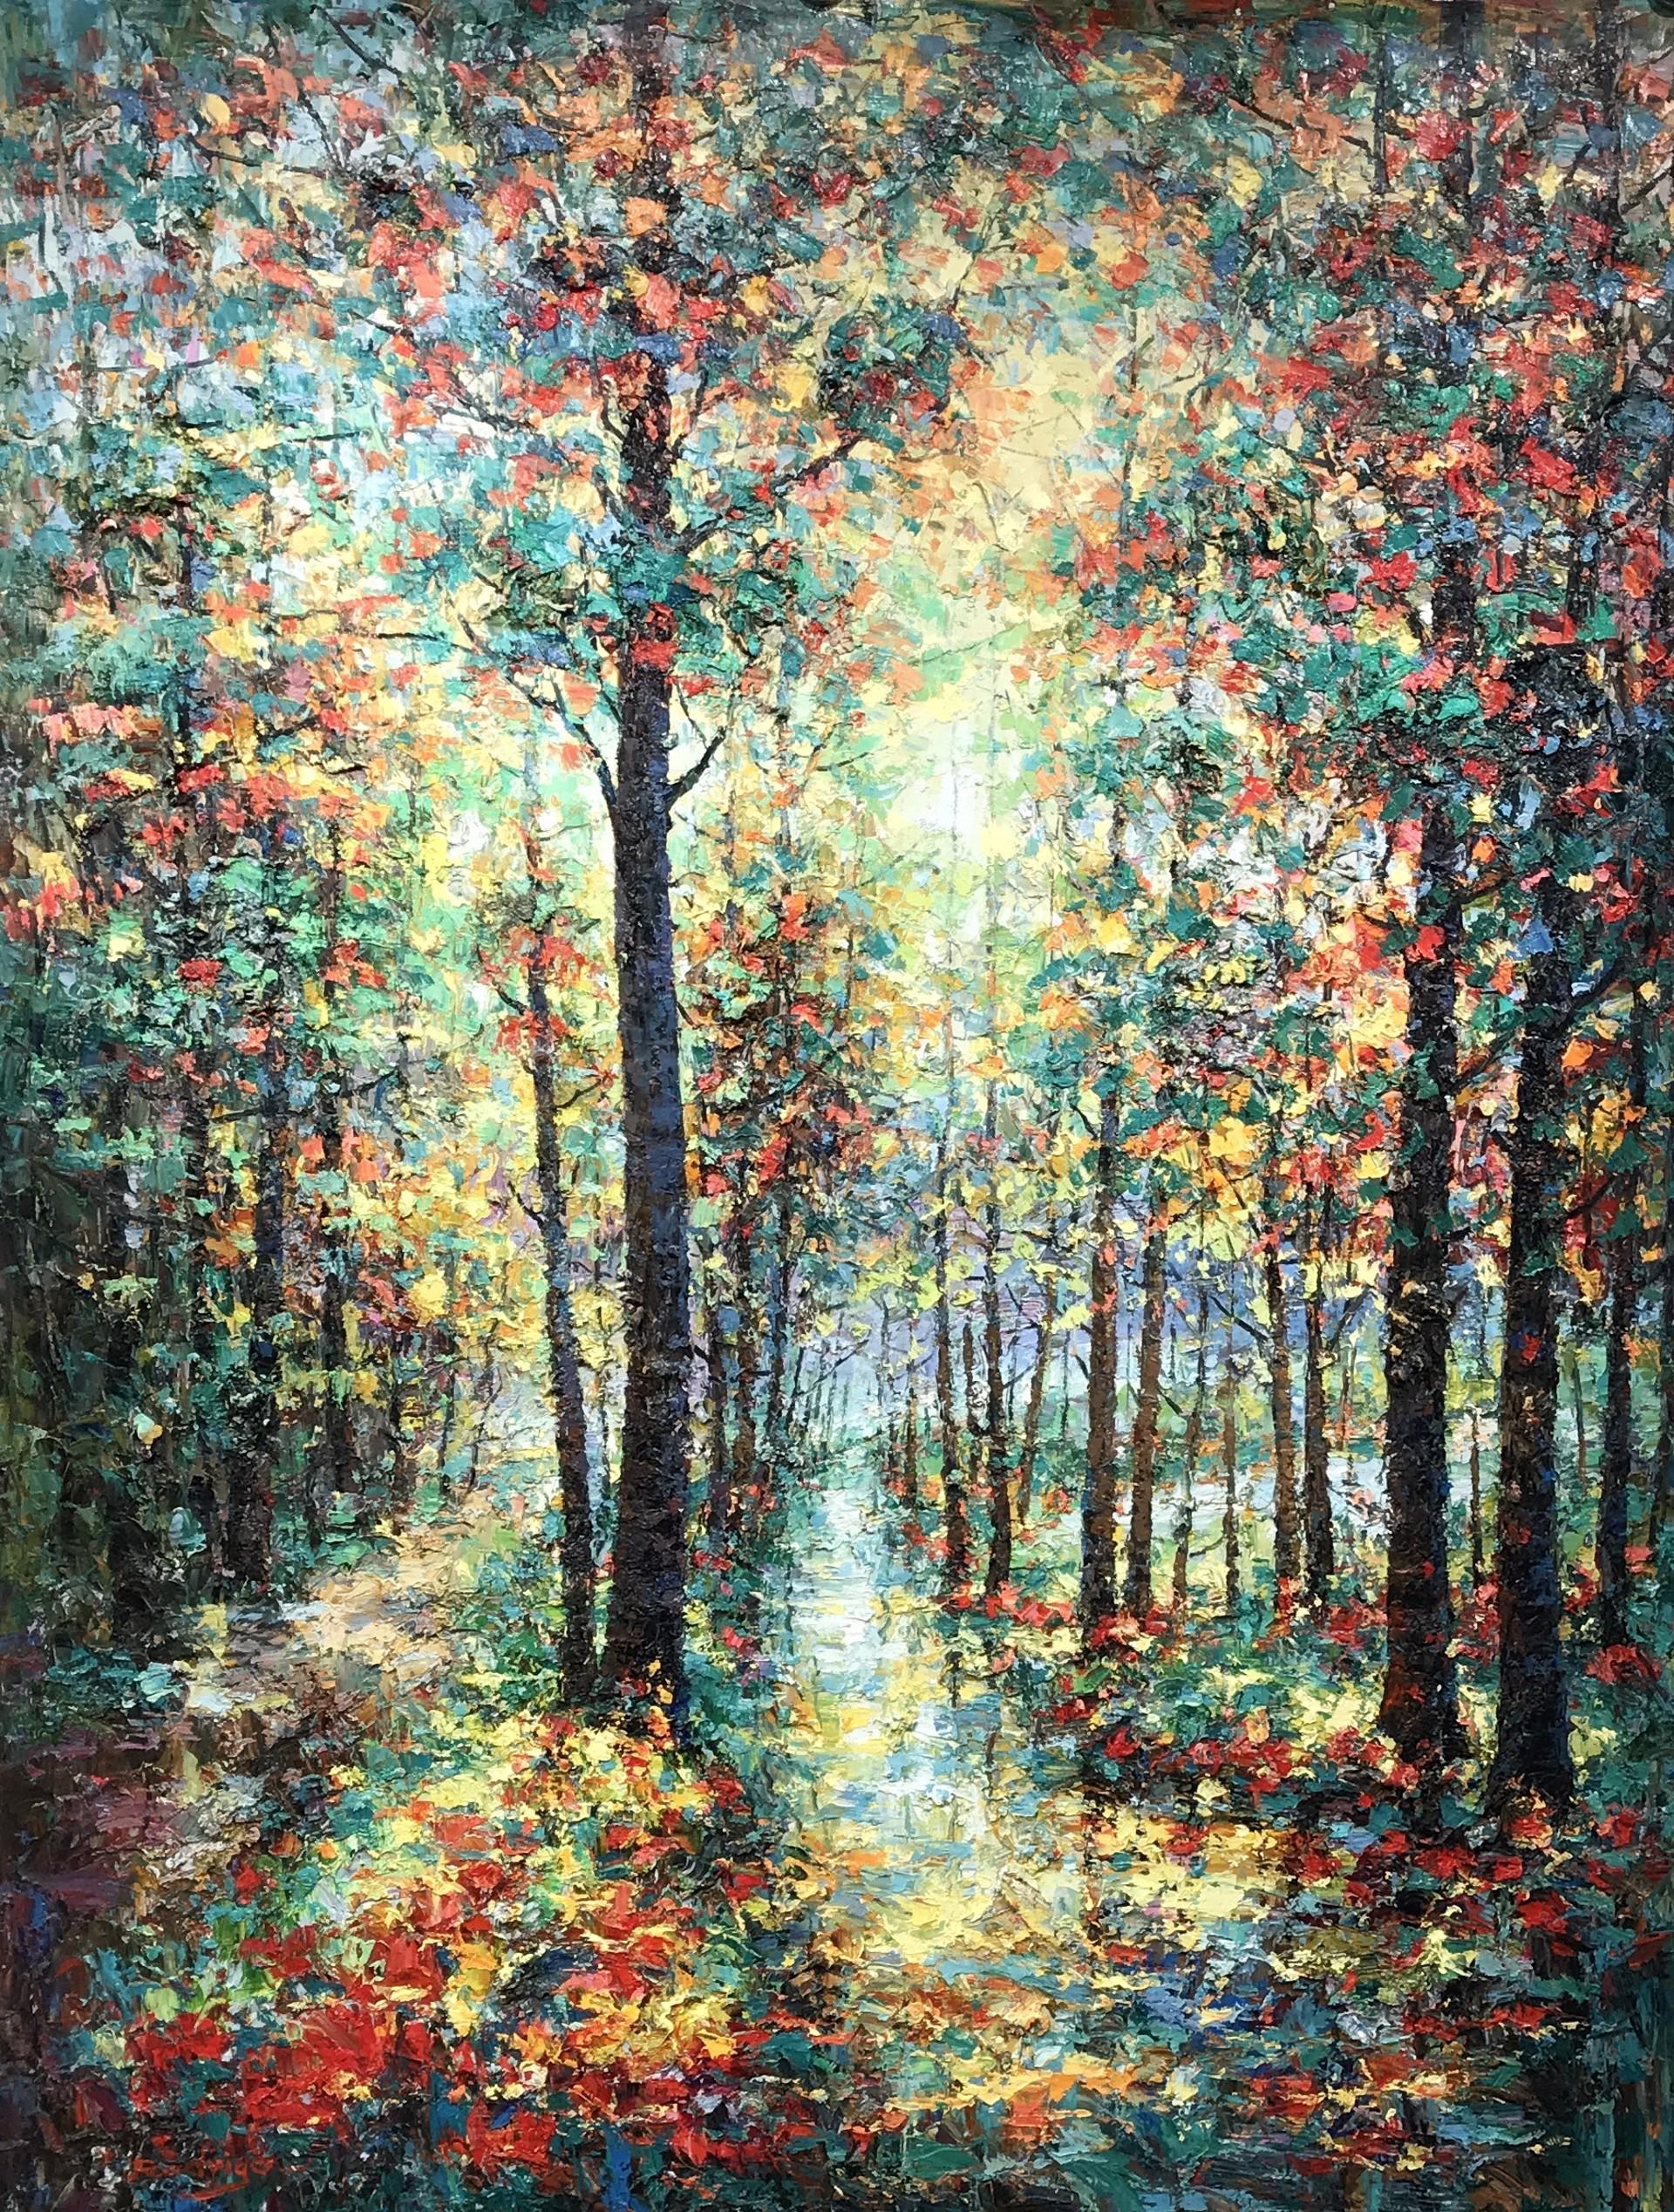 DARK TREES WITH BLUE PATH by RODRIGO